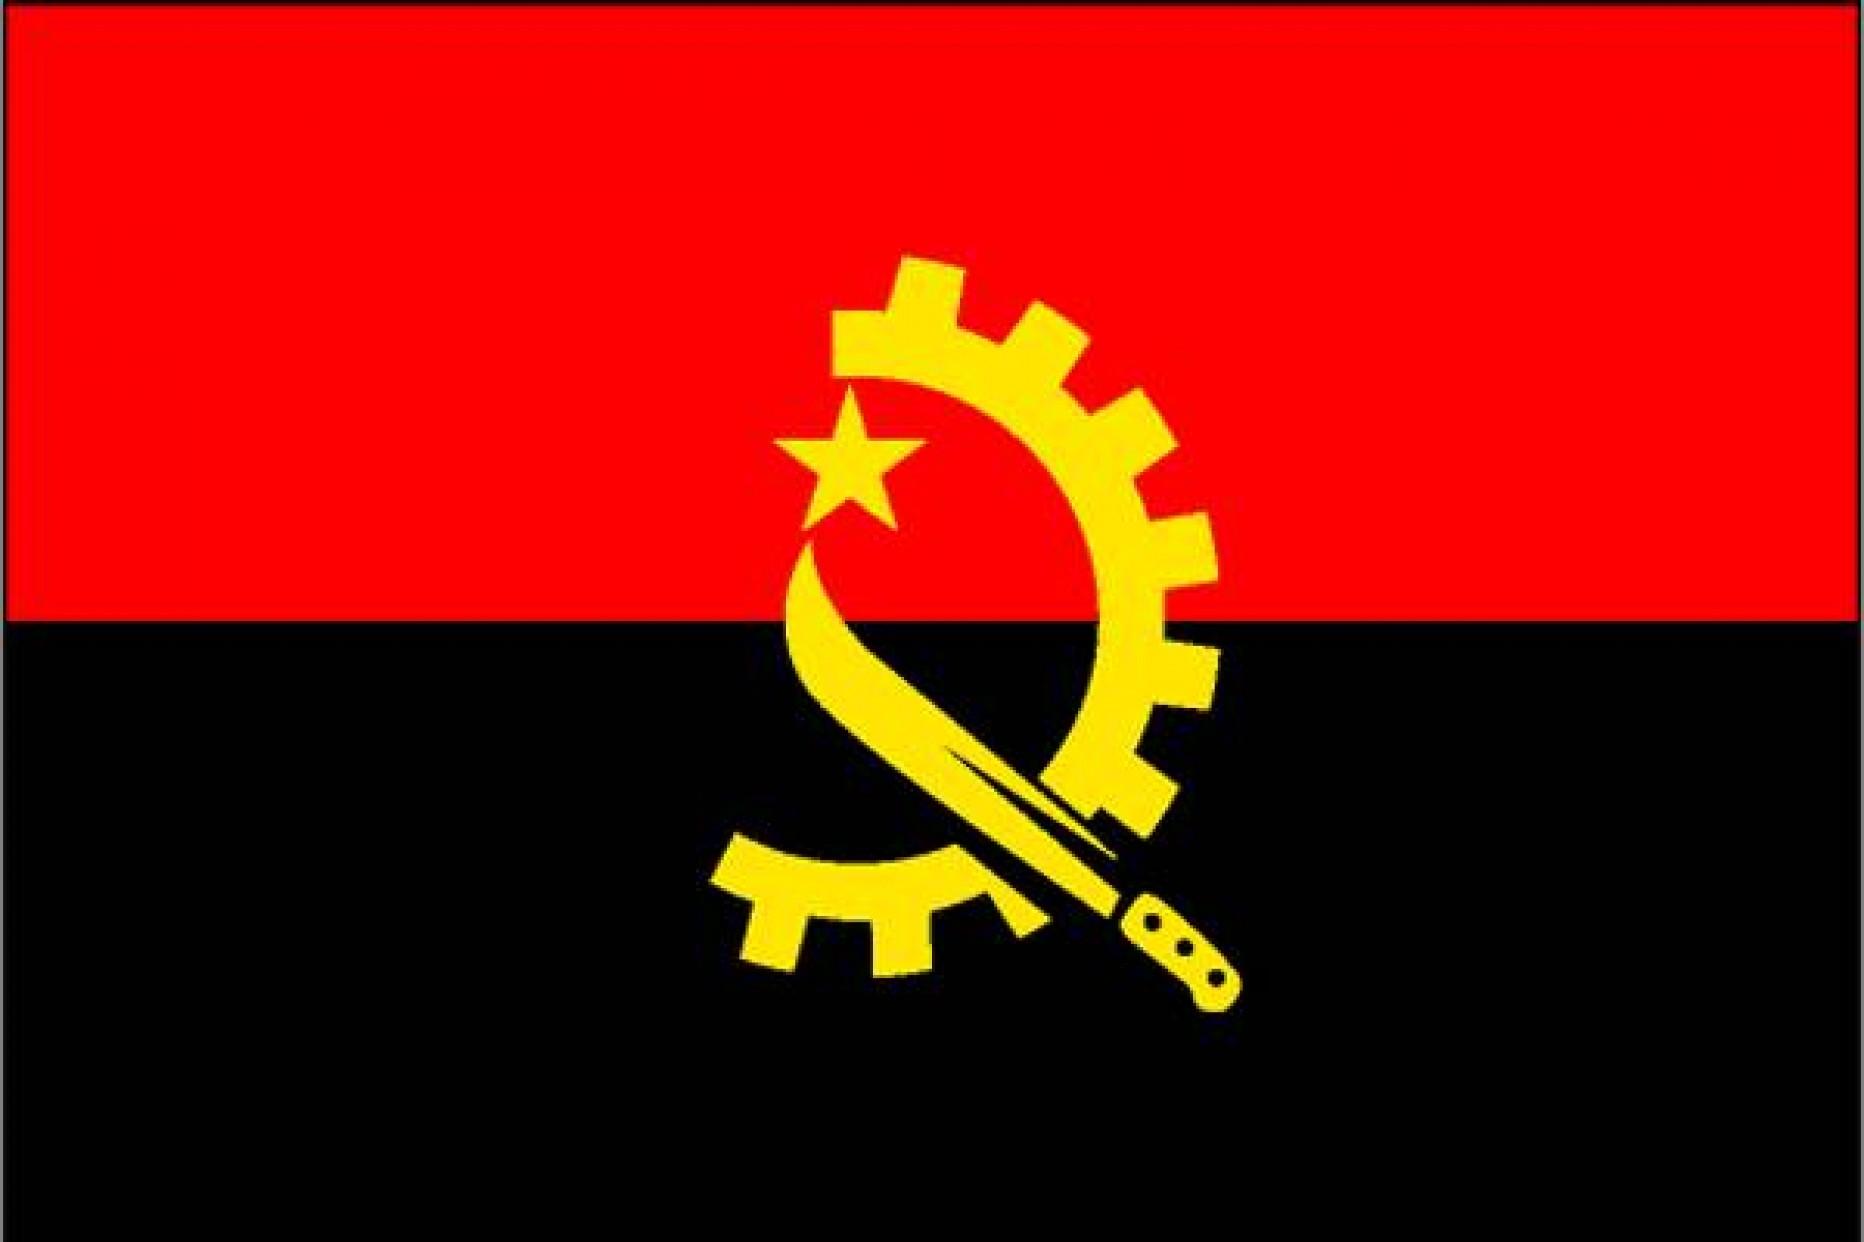 Ambassade d'Angola